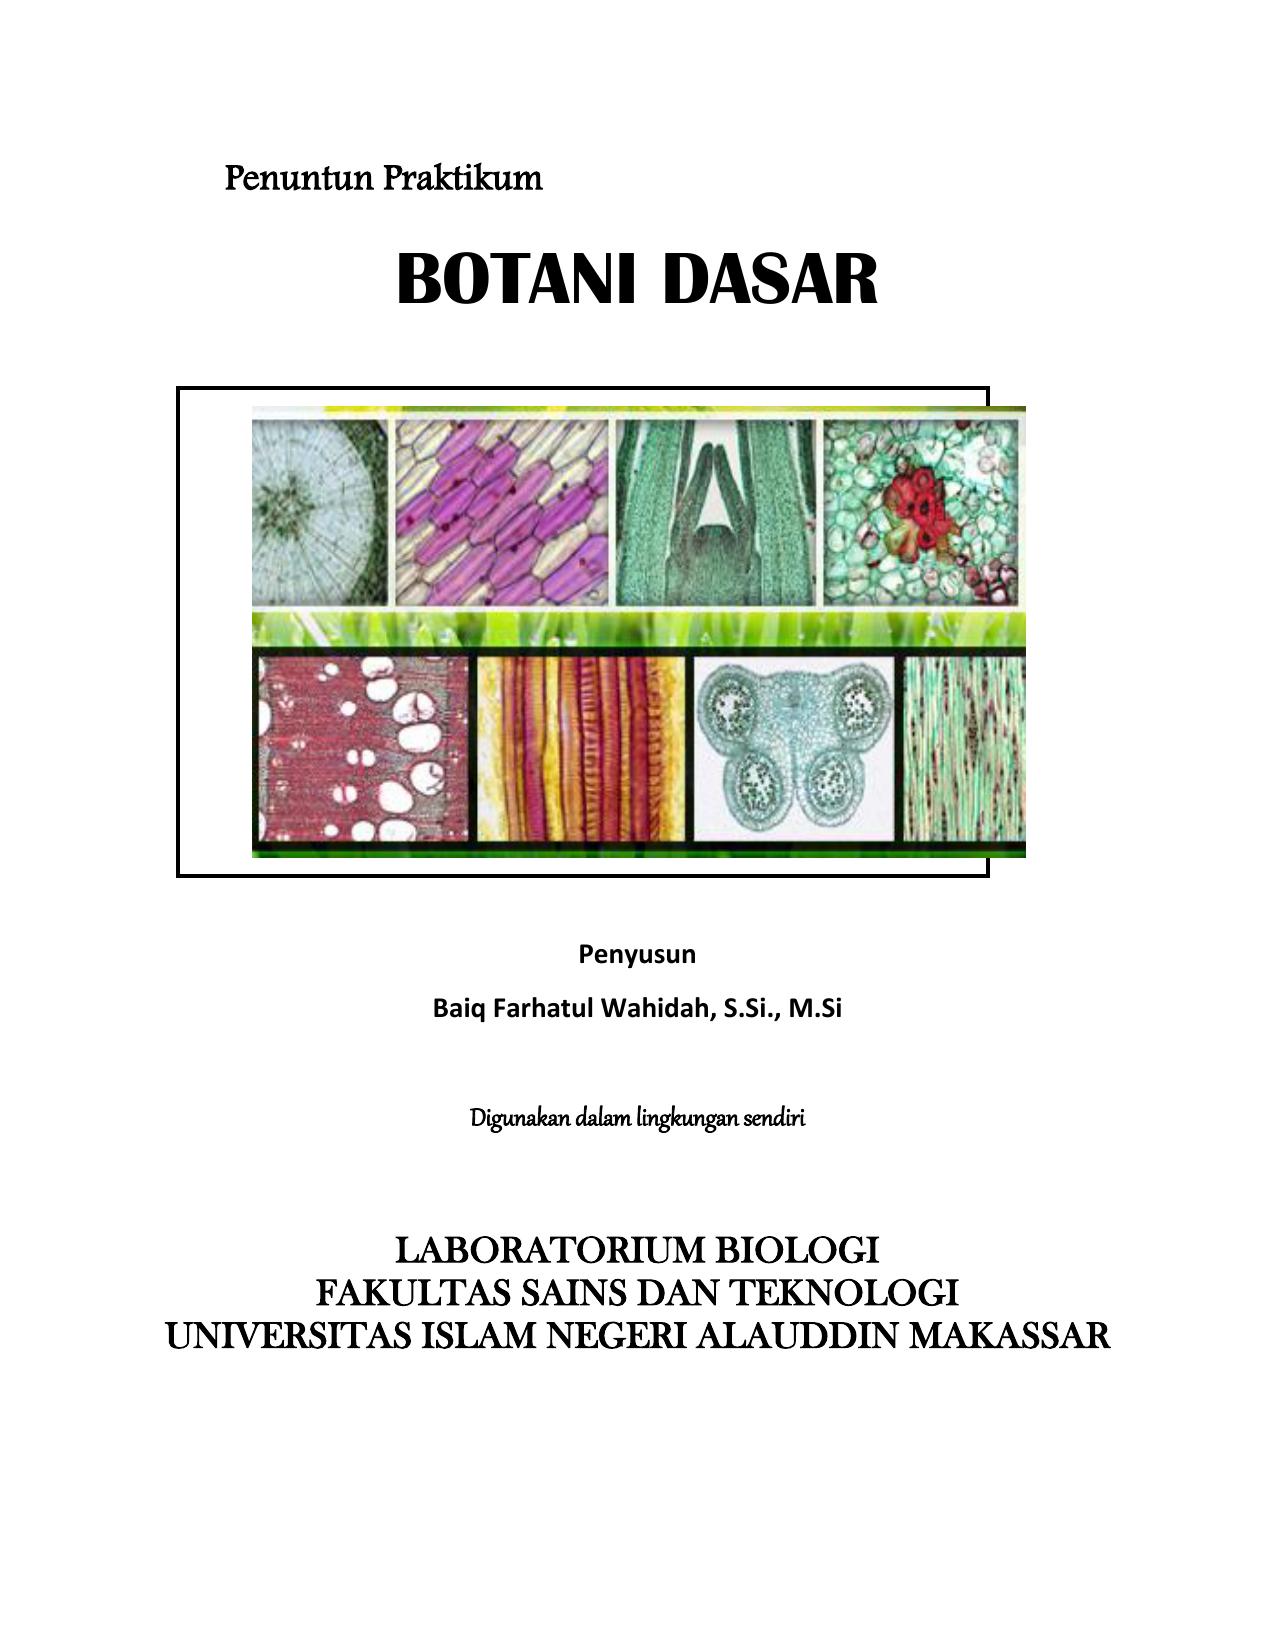 Botani dasar biologi uin alauddin makassar ccuart Gallery